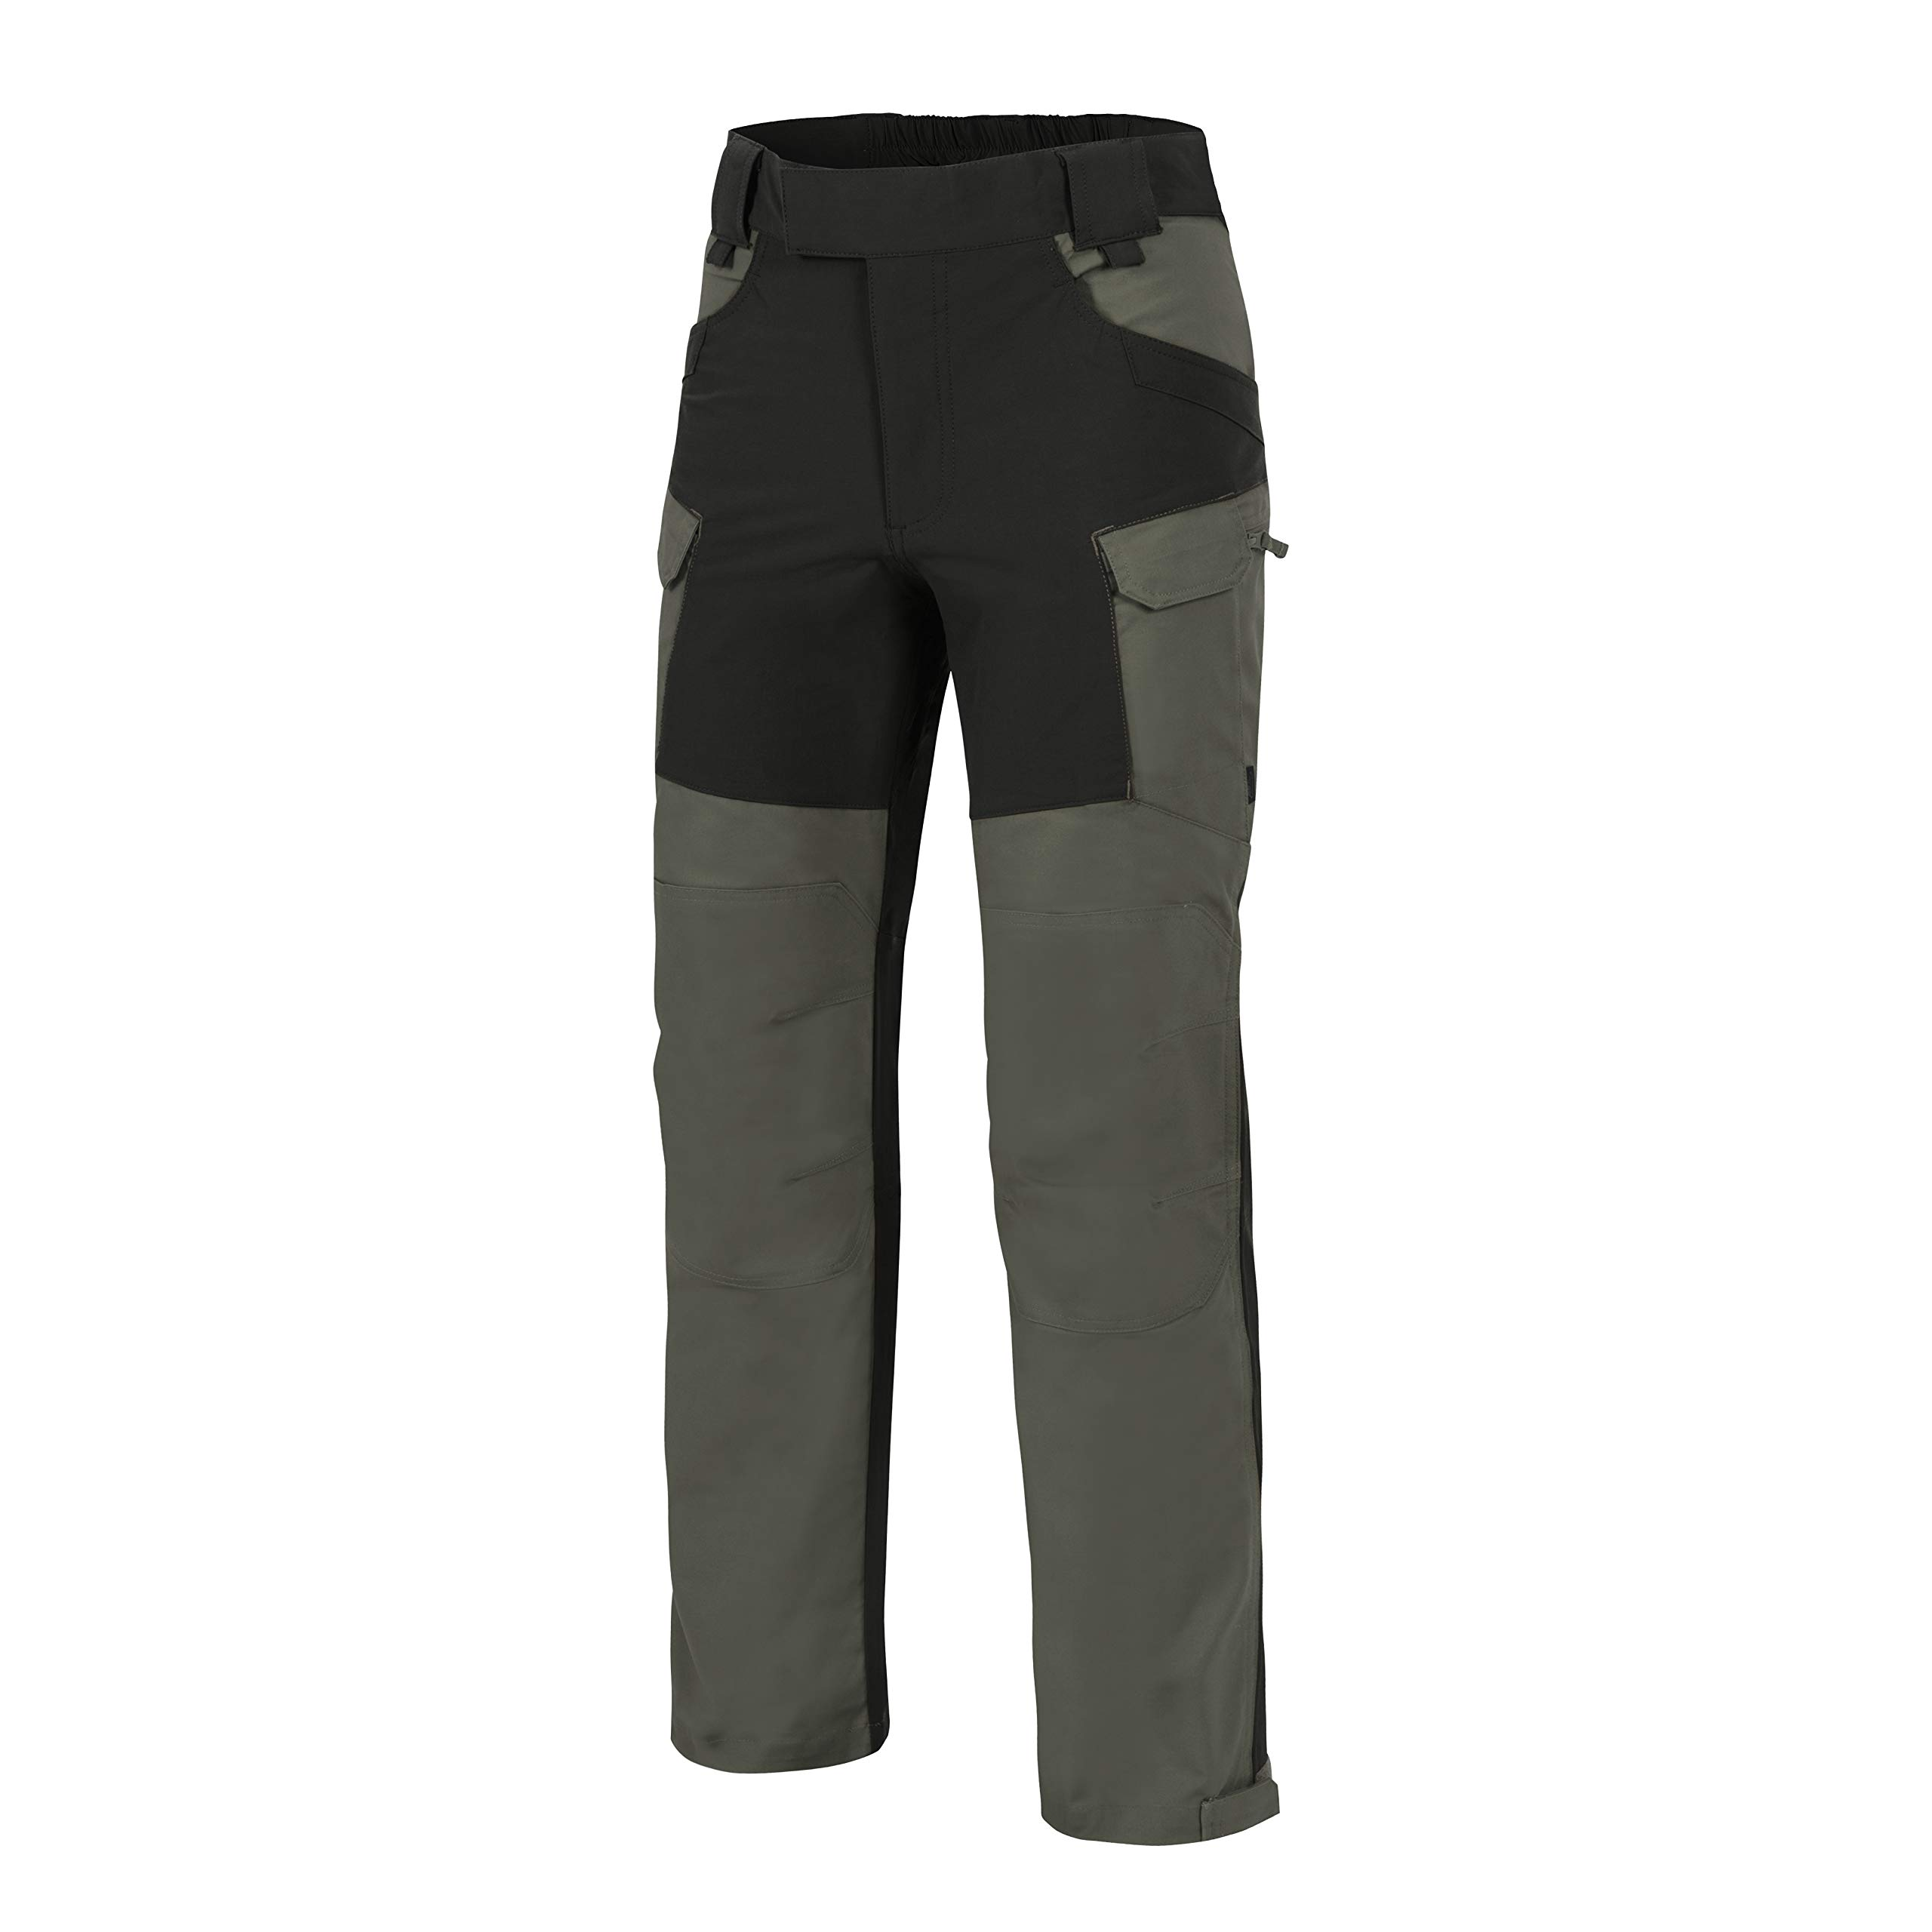 Helikon-Tex Outback Line, HOP Hybrid Outback Pants, DuraCanvas VersaStretch